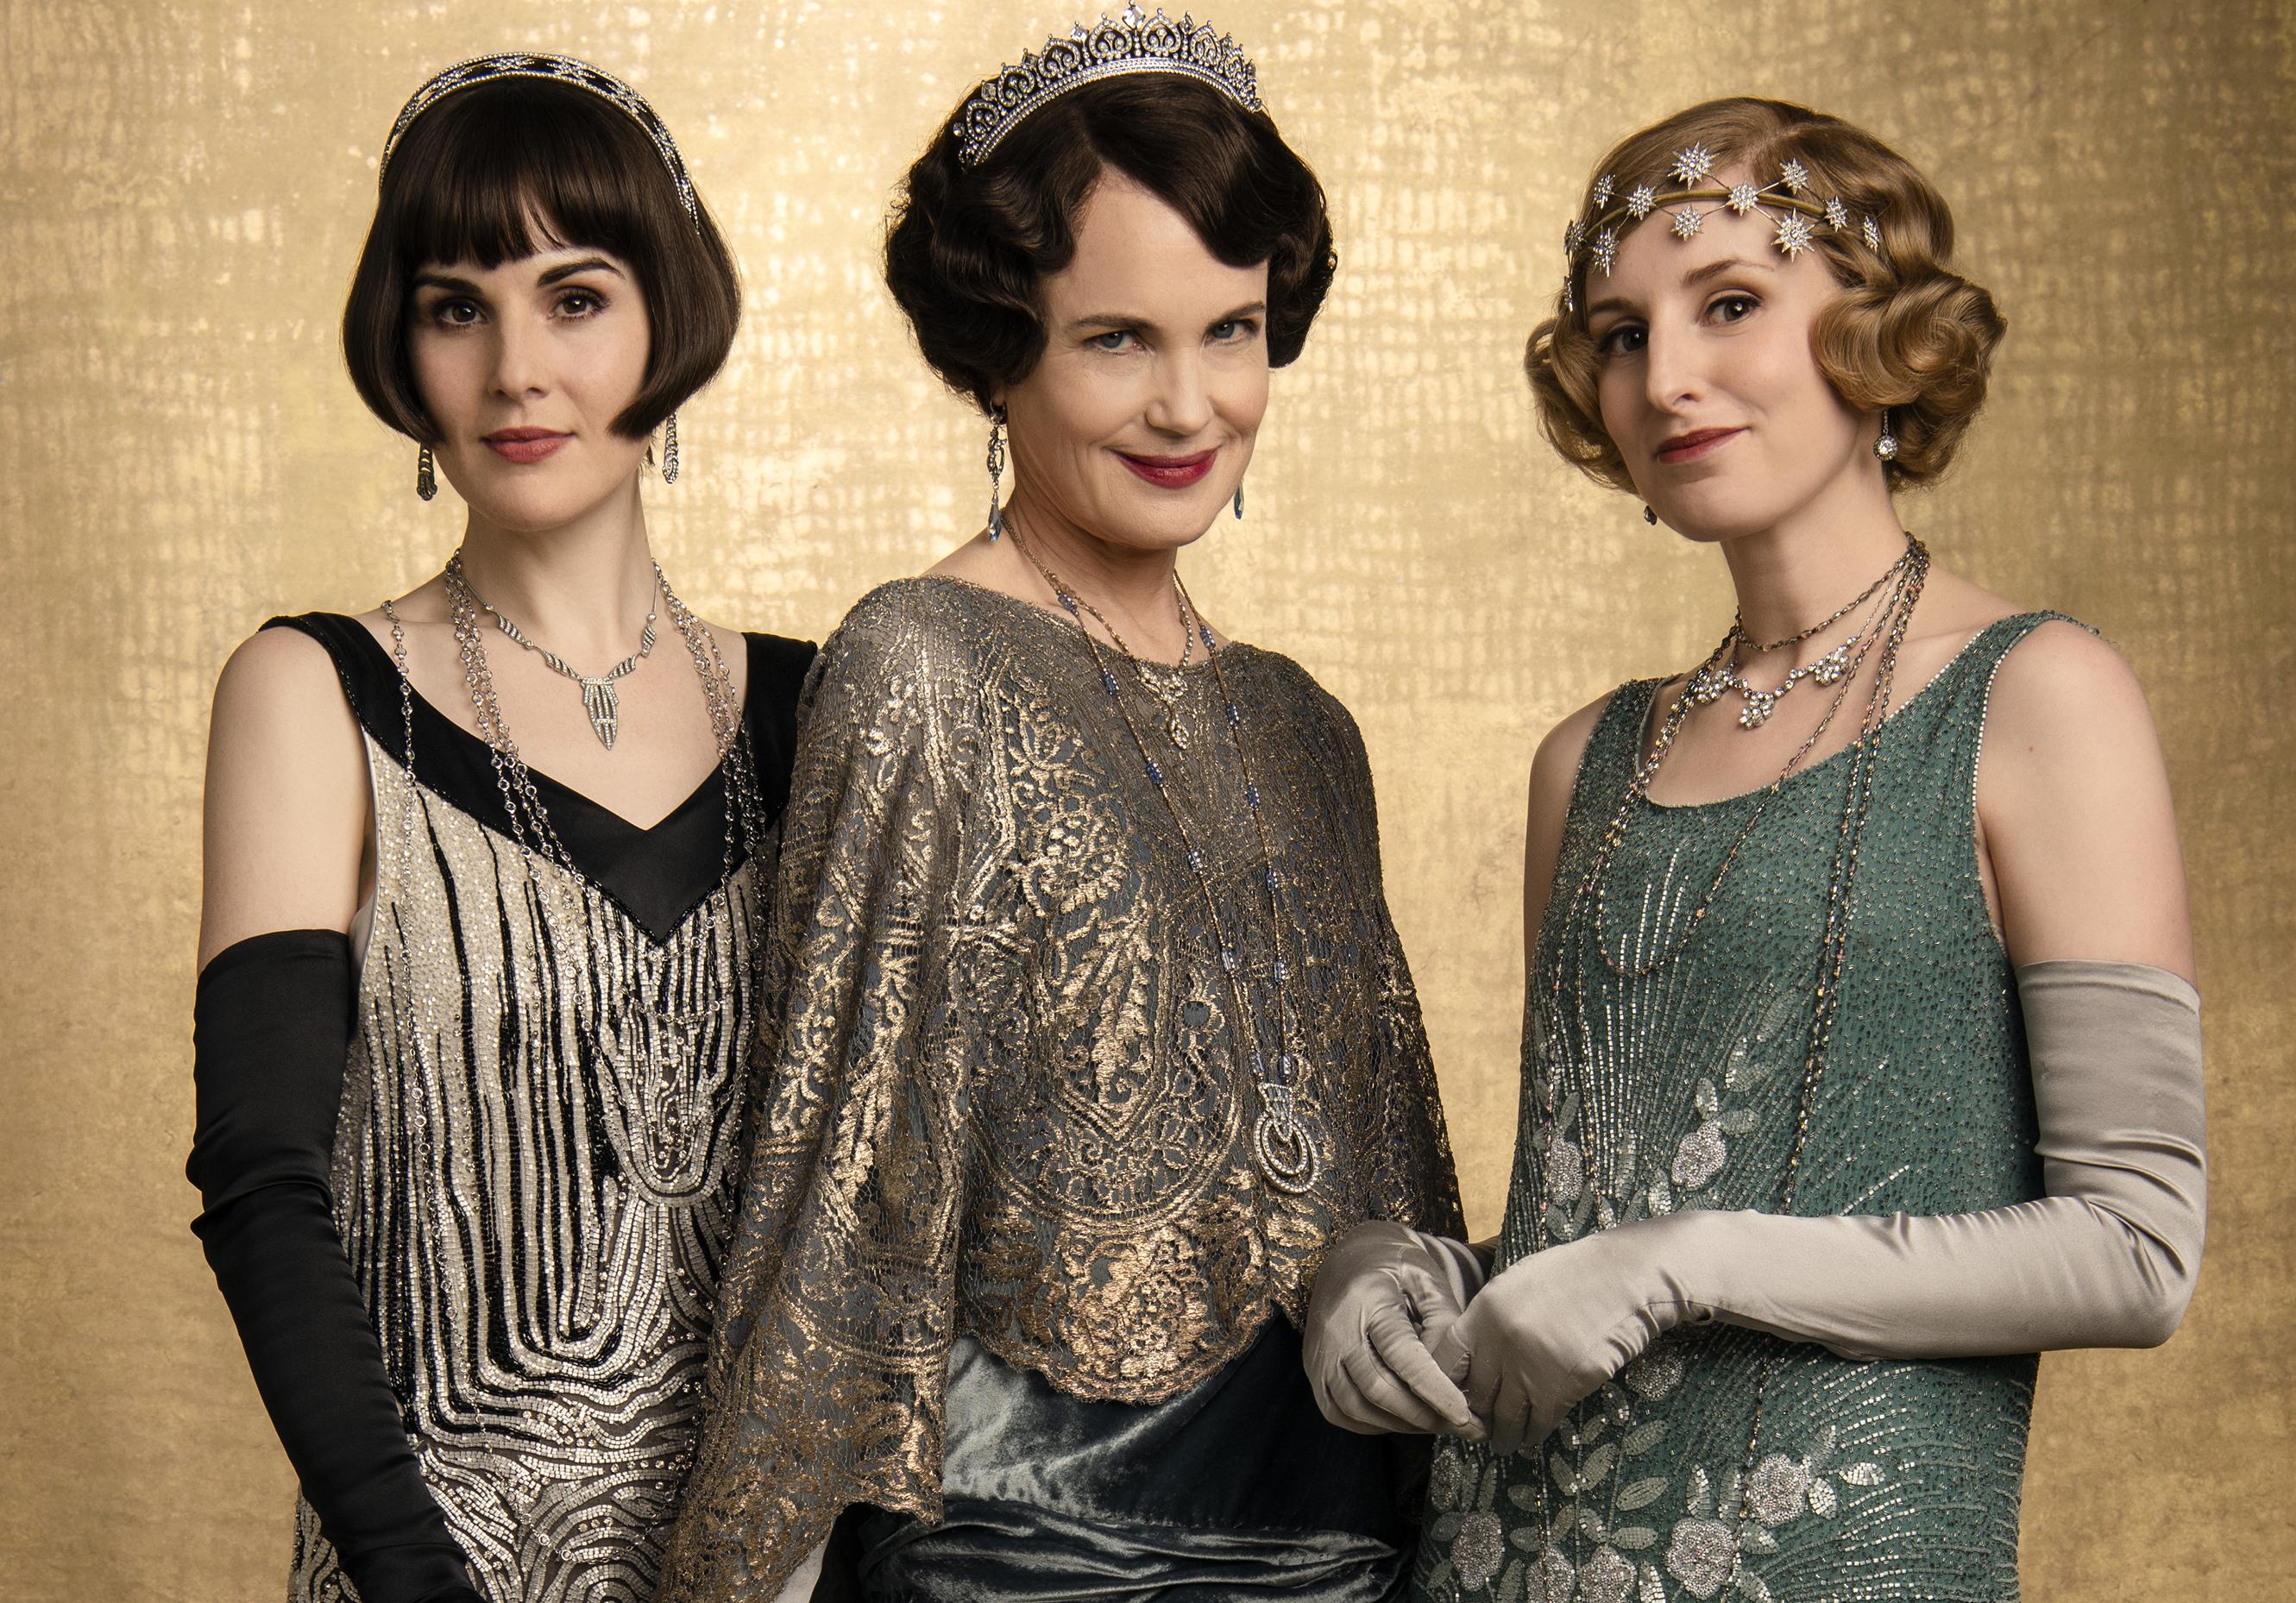 Downton Abbey Movie & TV British Stereotypes